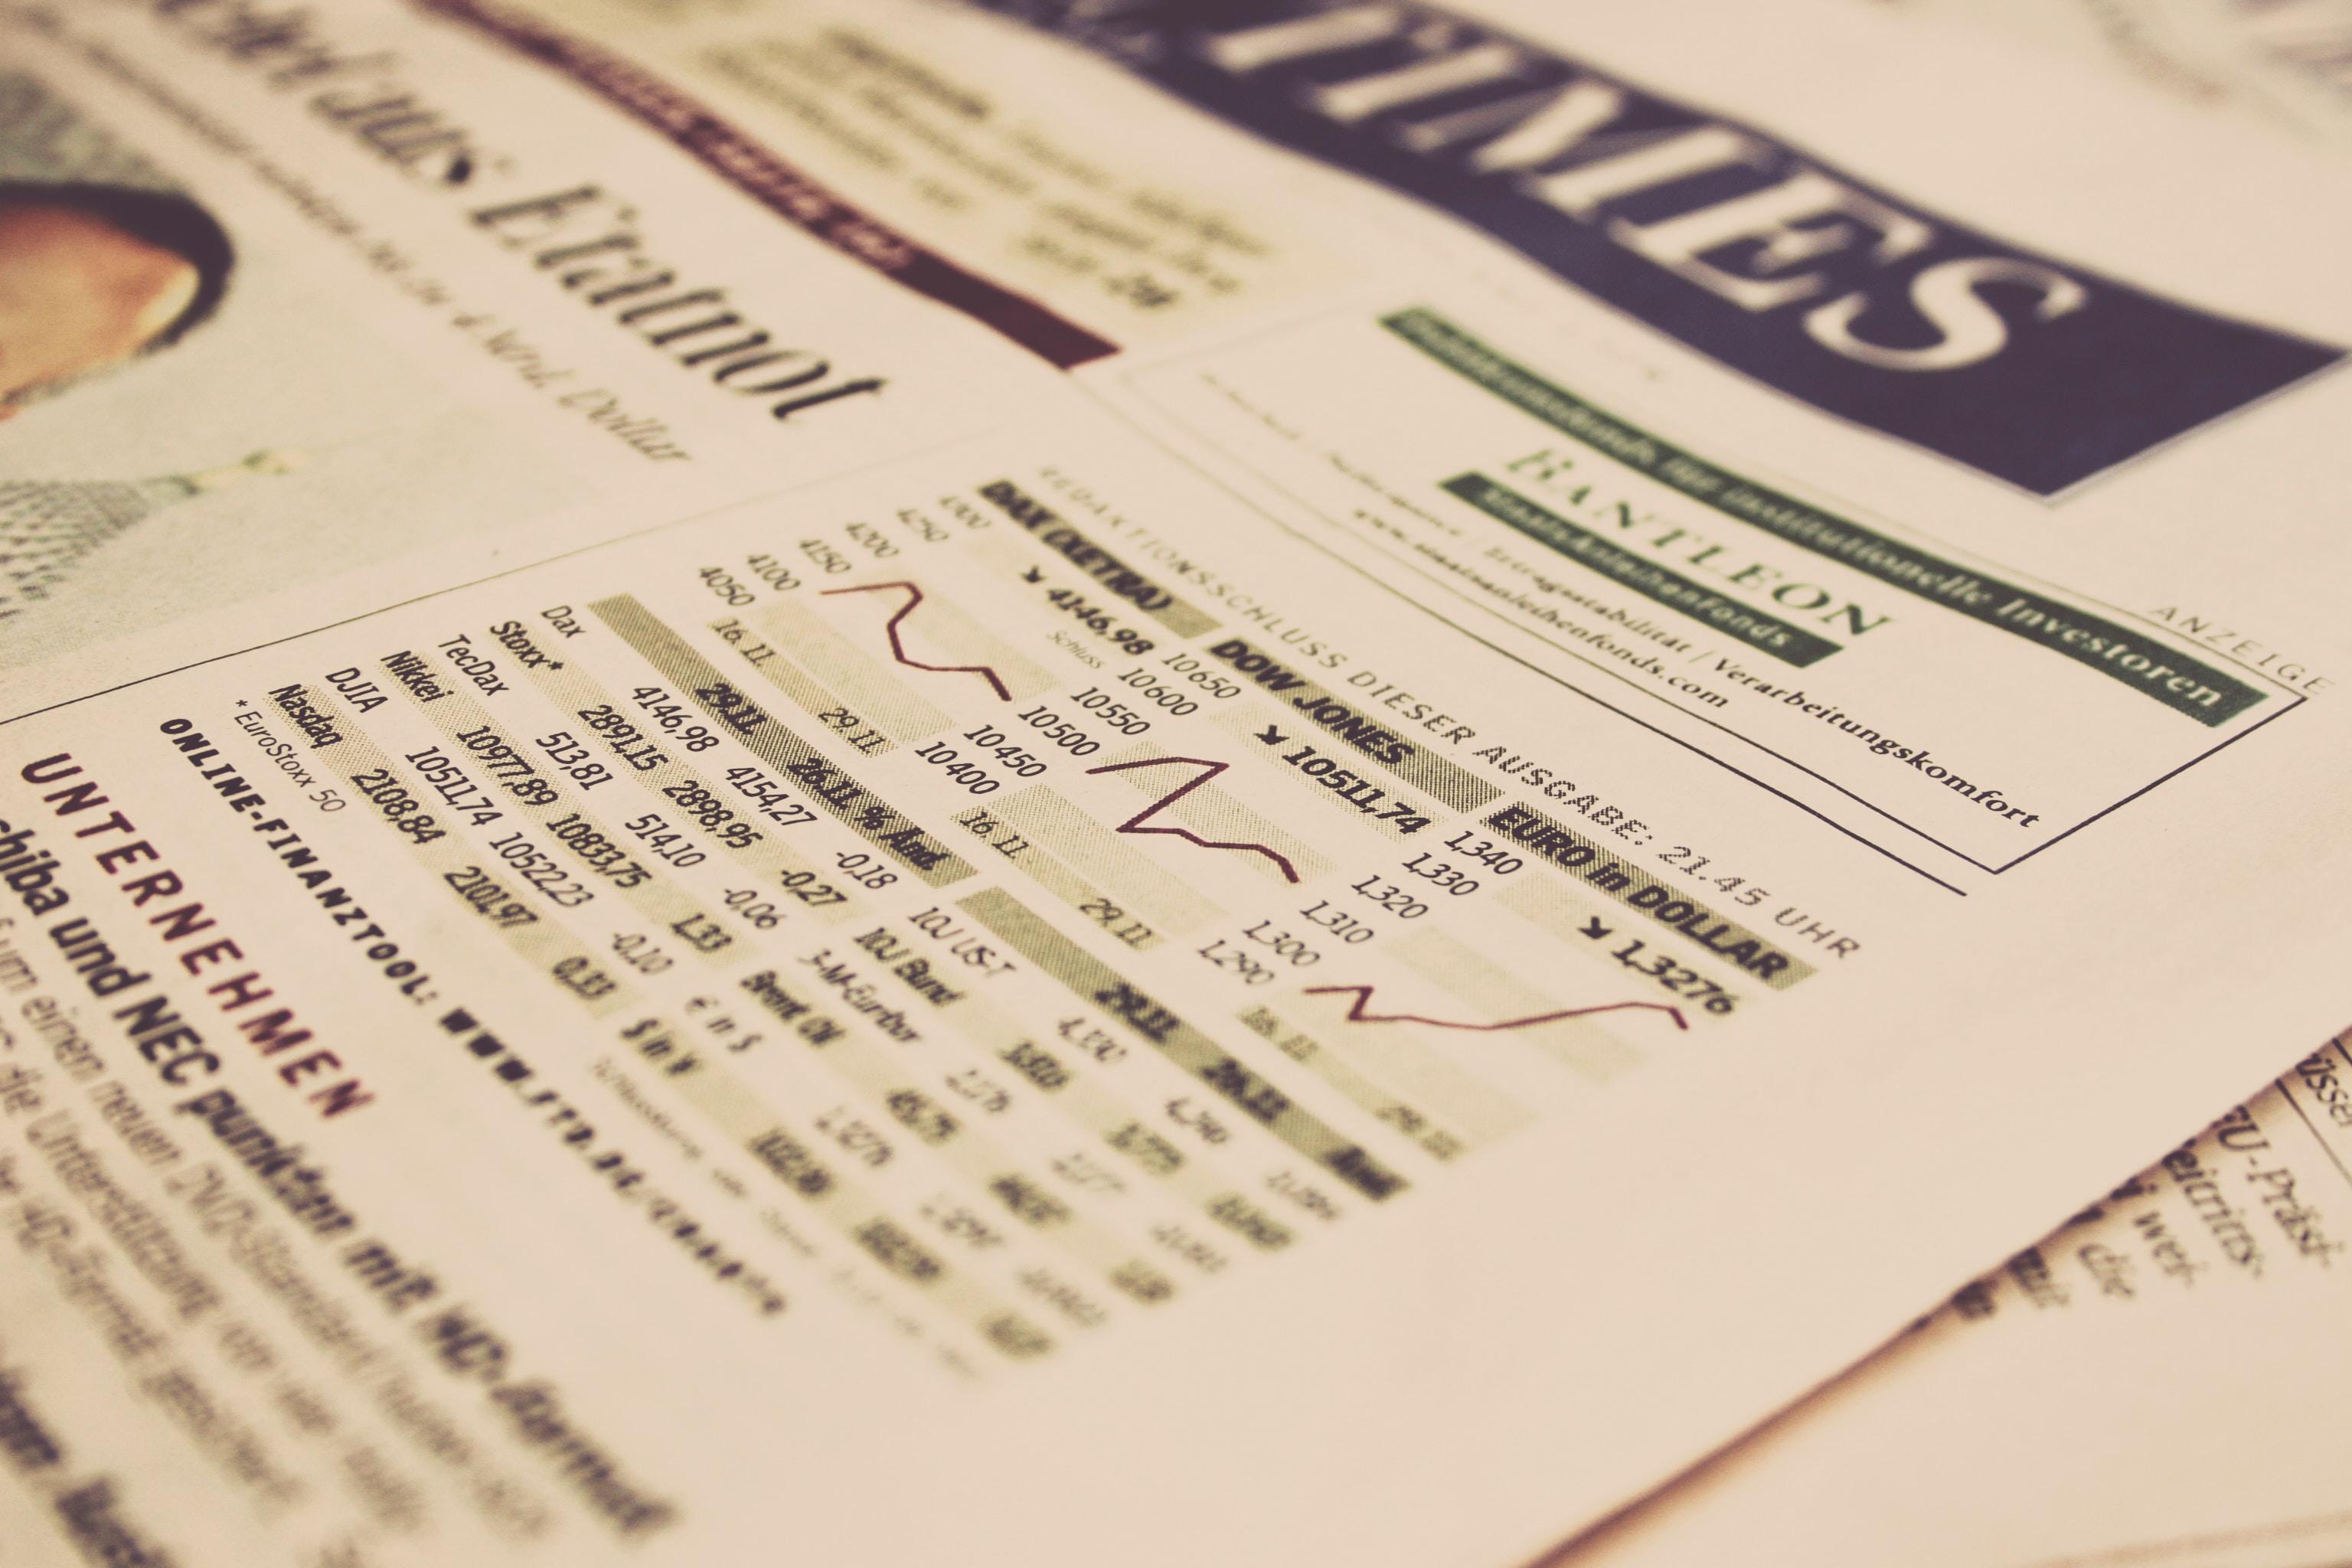 Dr Alex Mihailov published a new paper in Economic Modelling